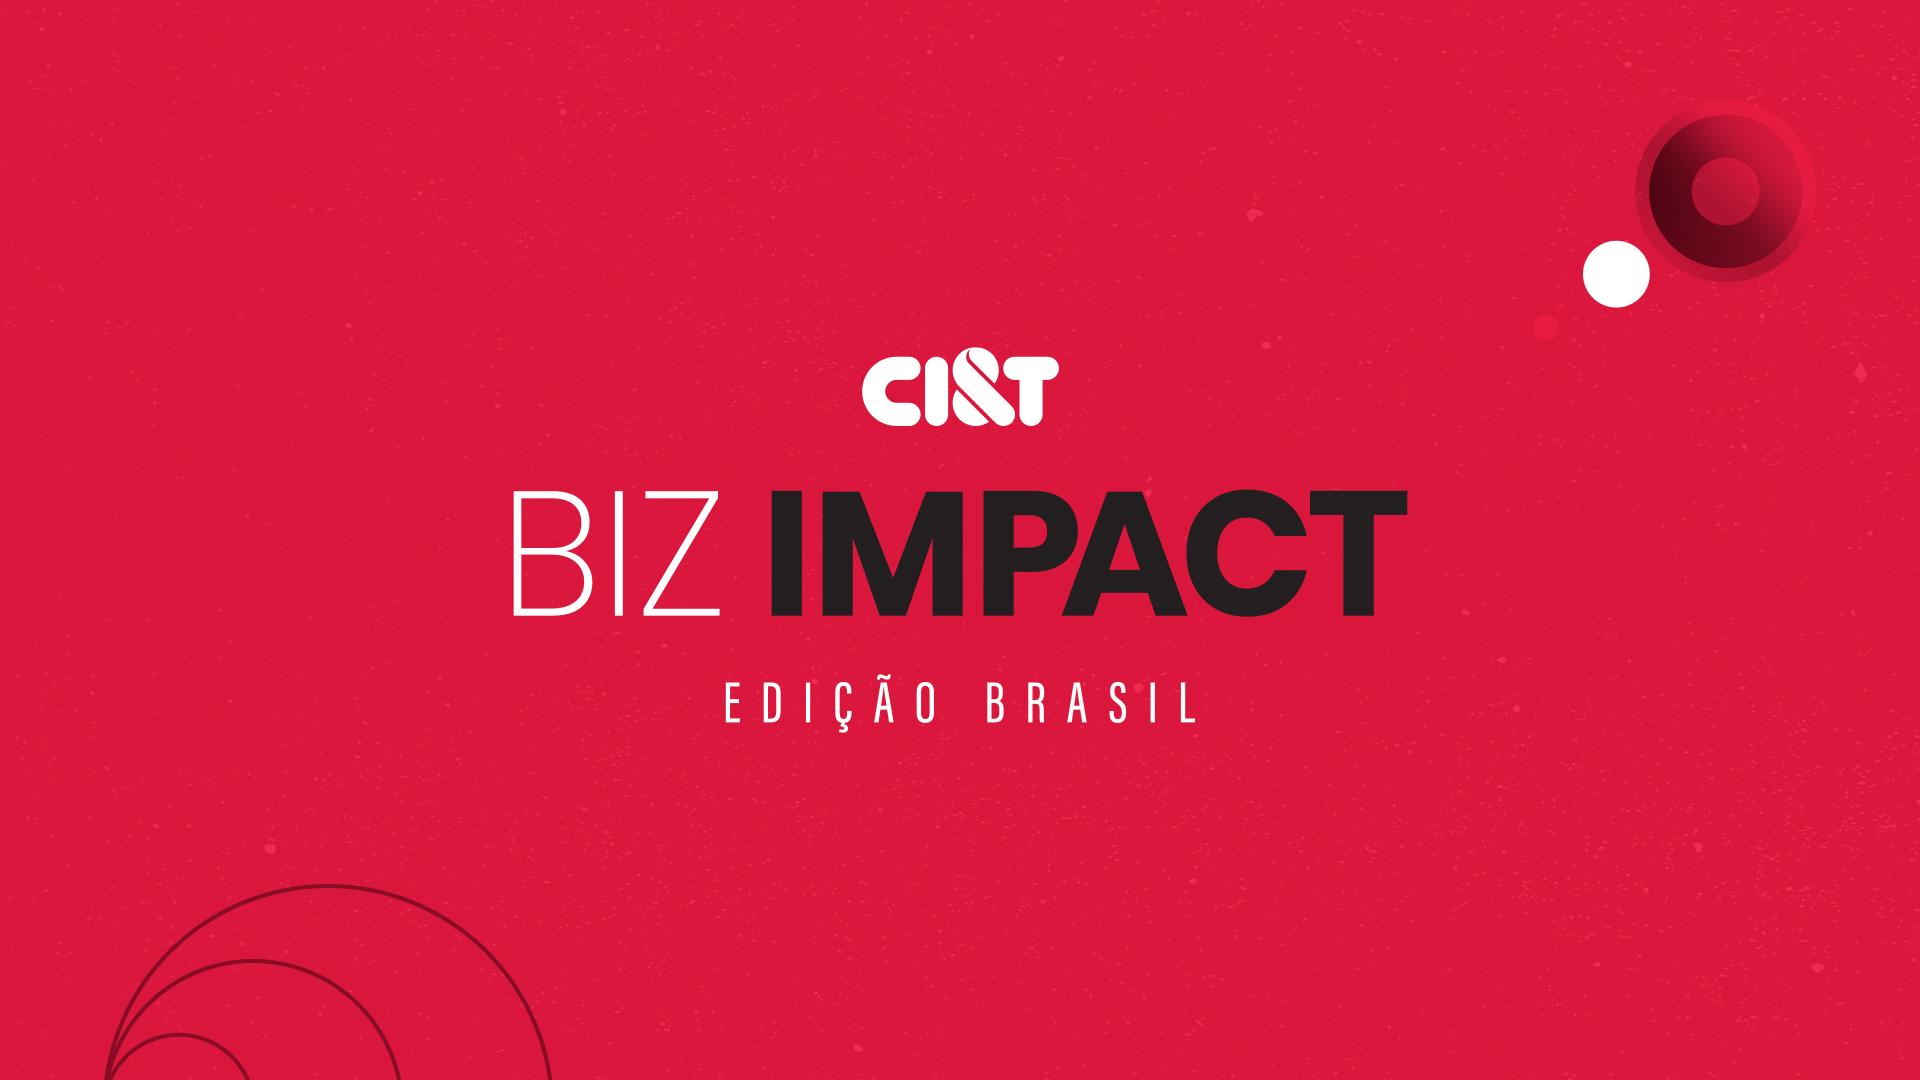 Tema Biz Impact 2021